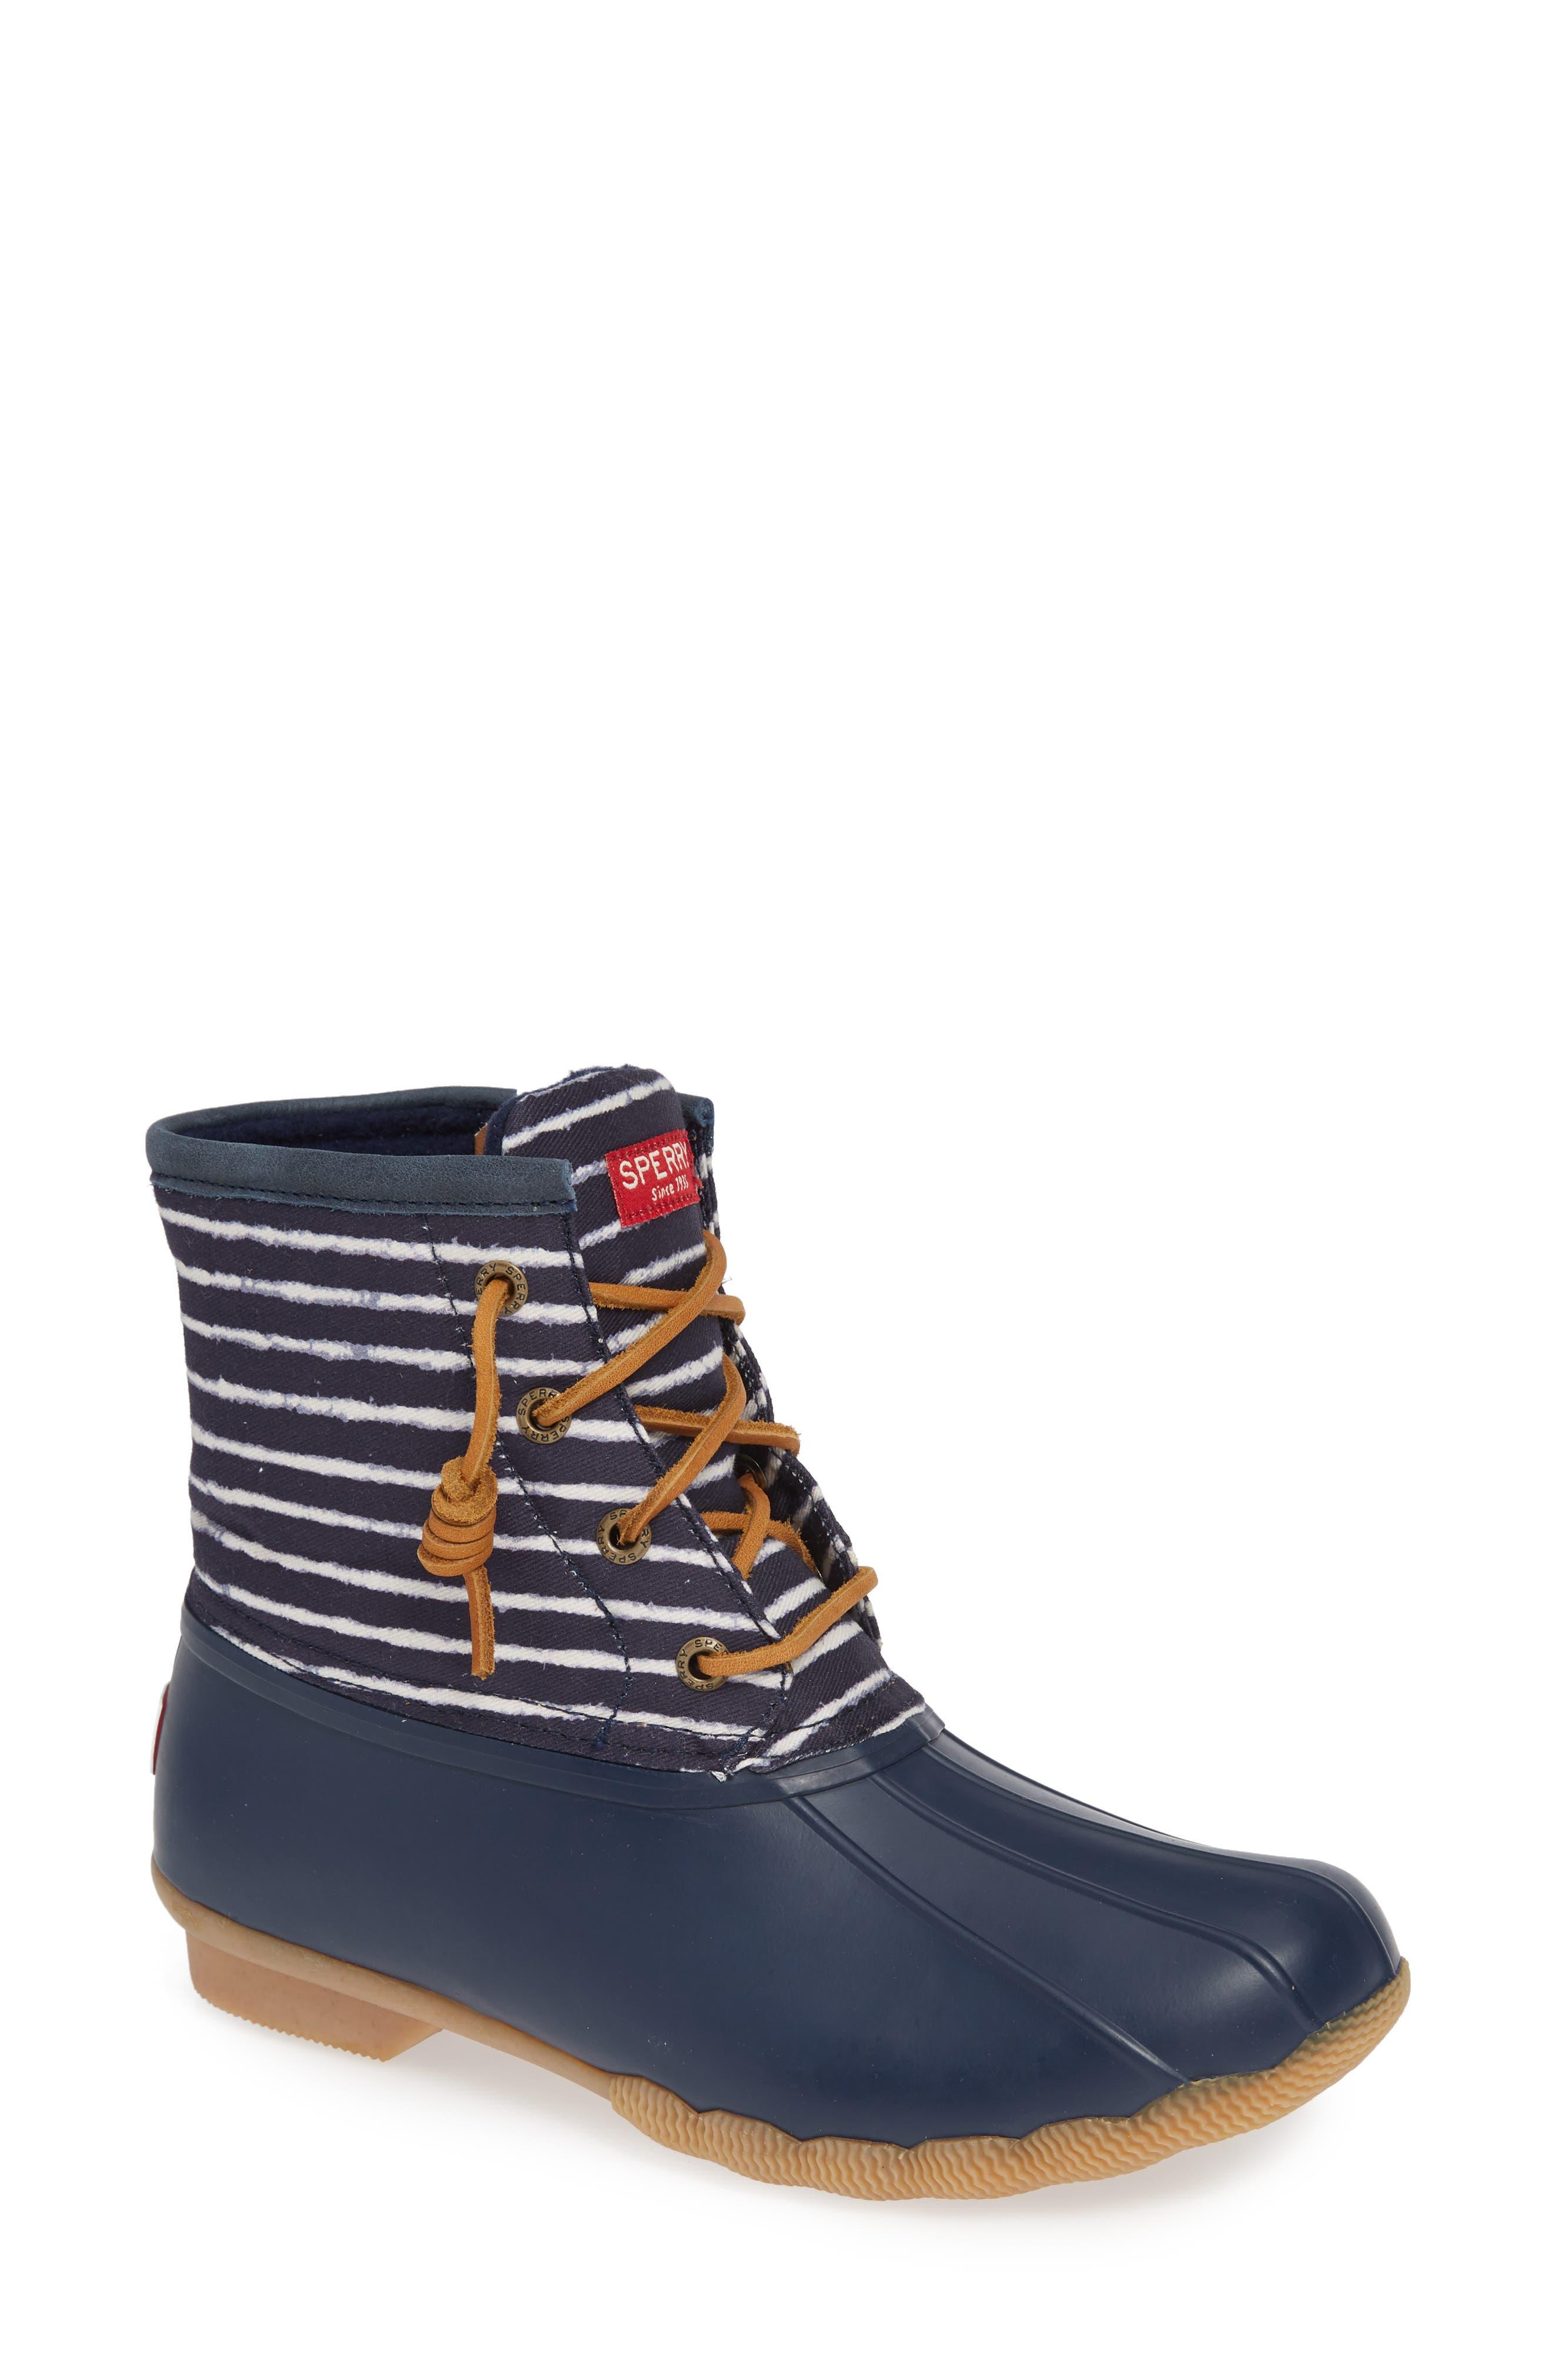 Saltwater Waterproof Rain Boot,                             Main thumbnail 1, color,                             NAVY FABRIC